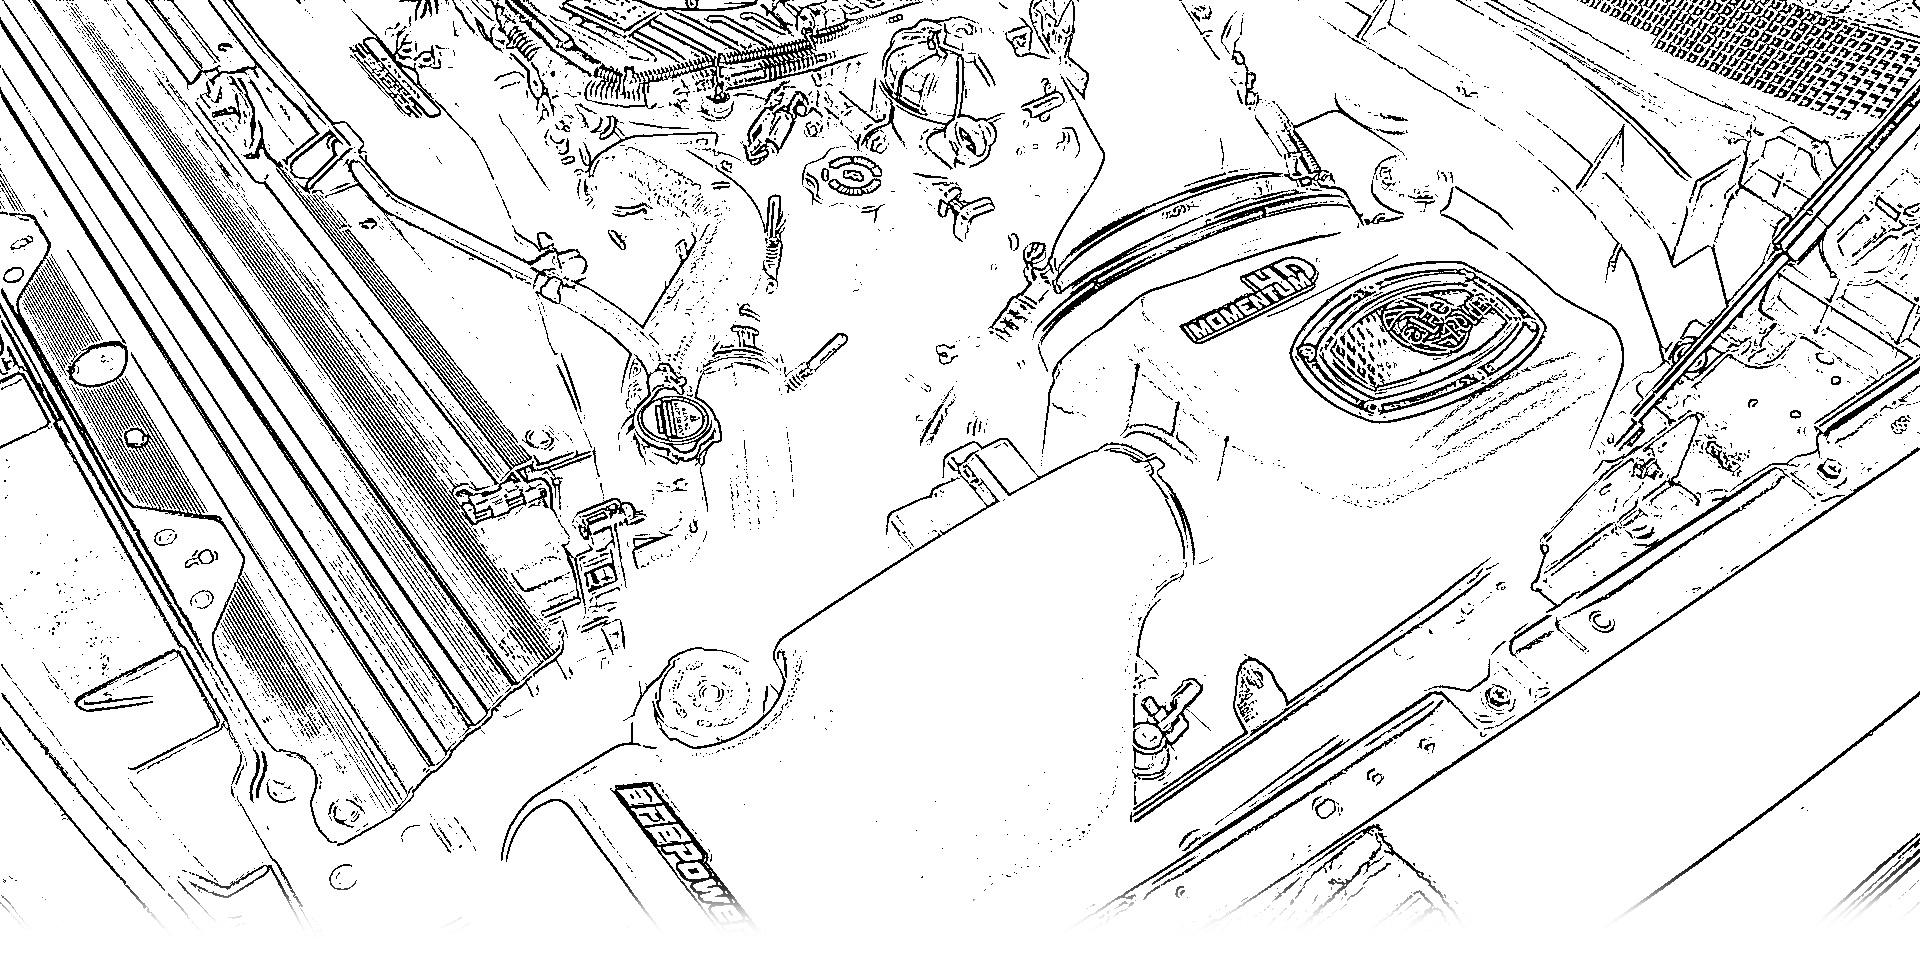 Install-Shot-Sketch